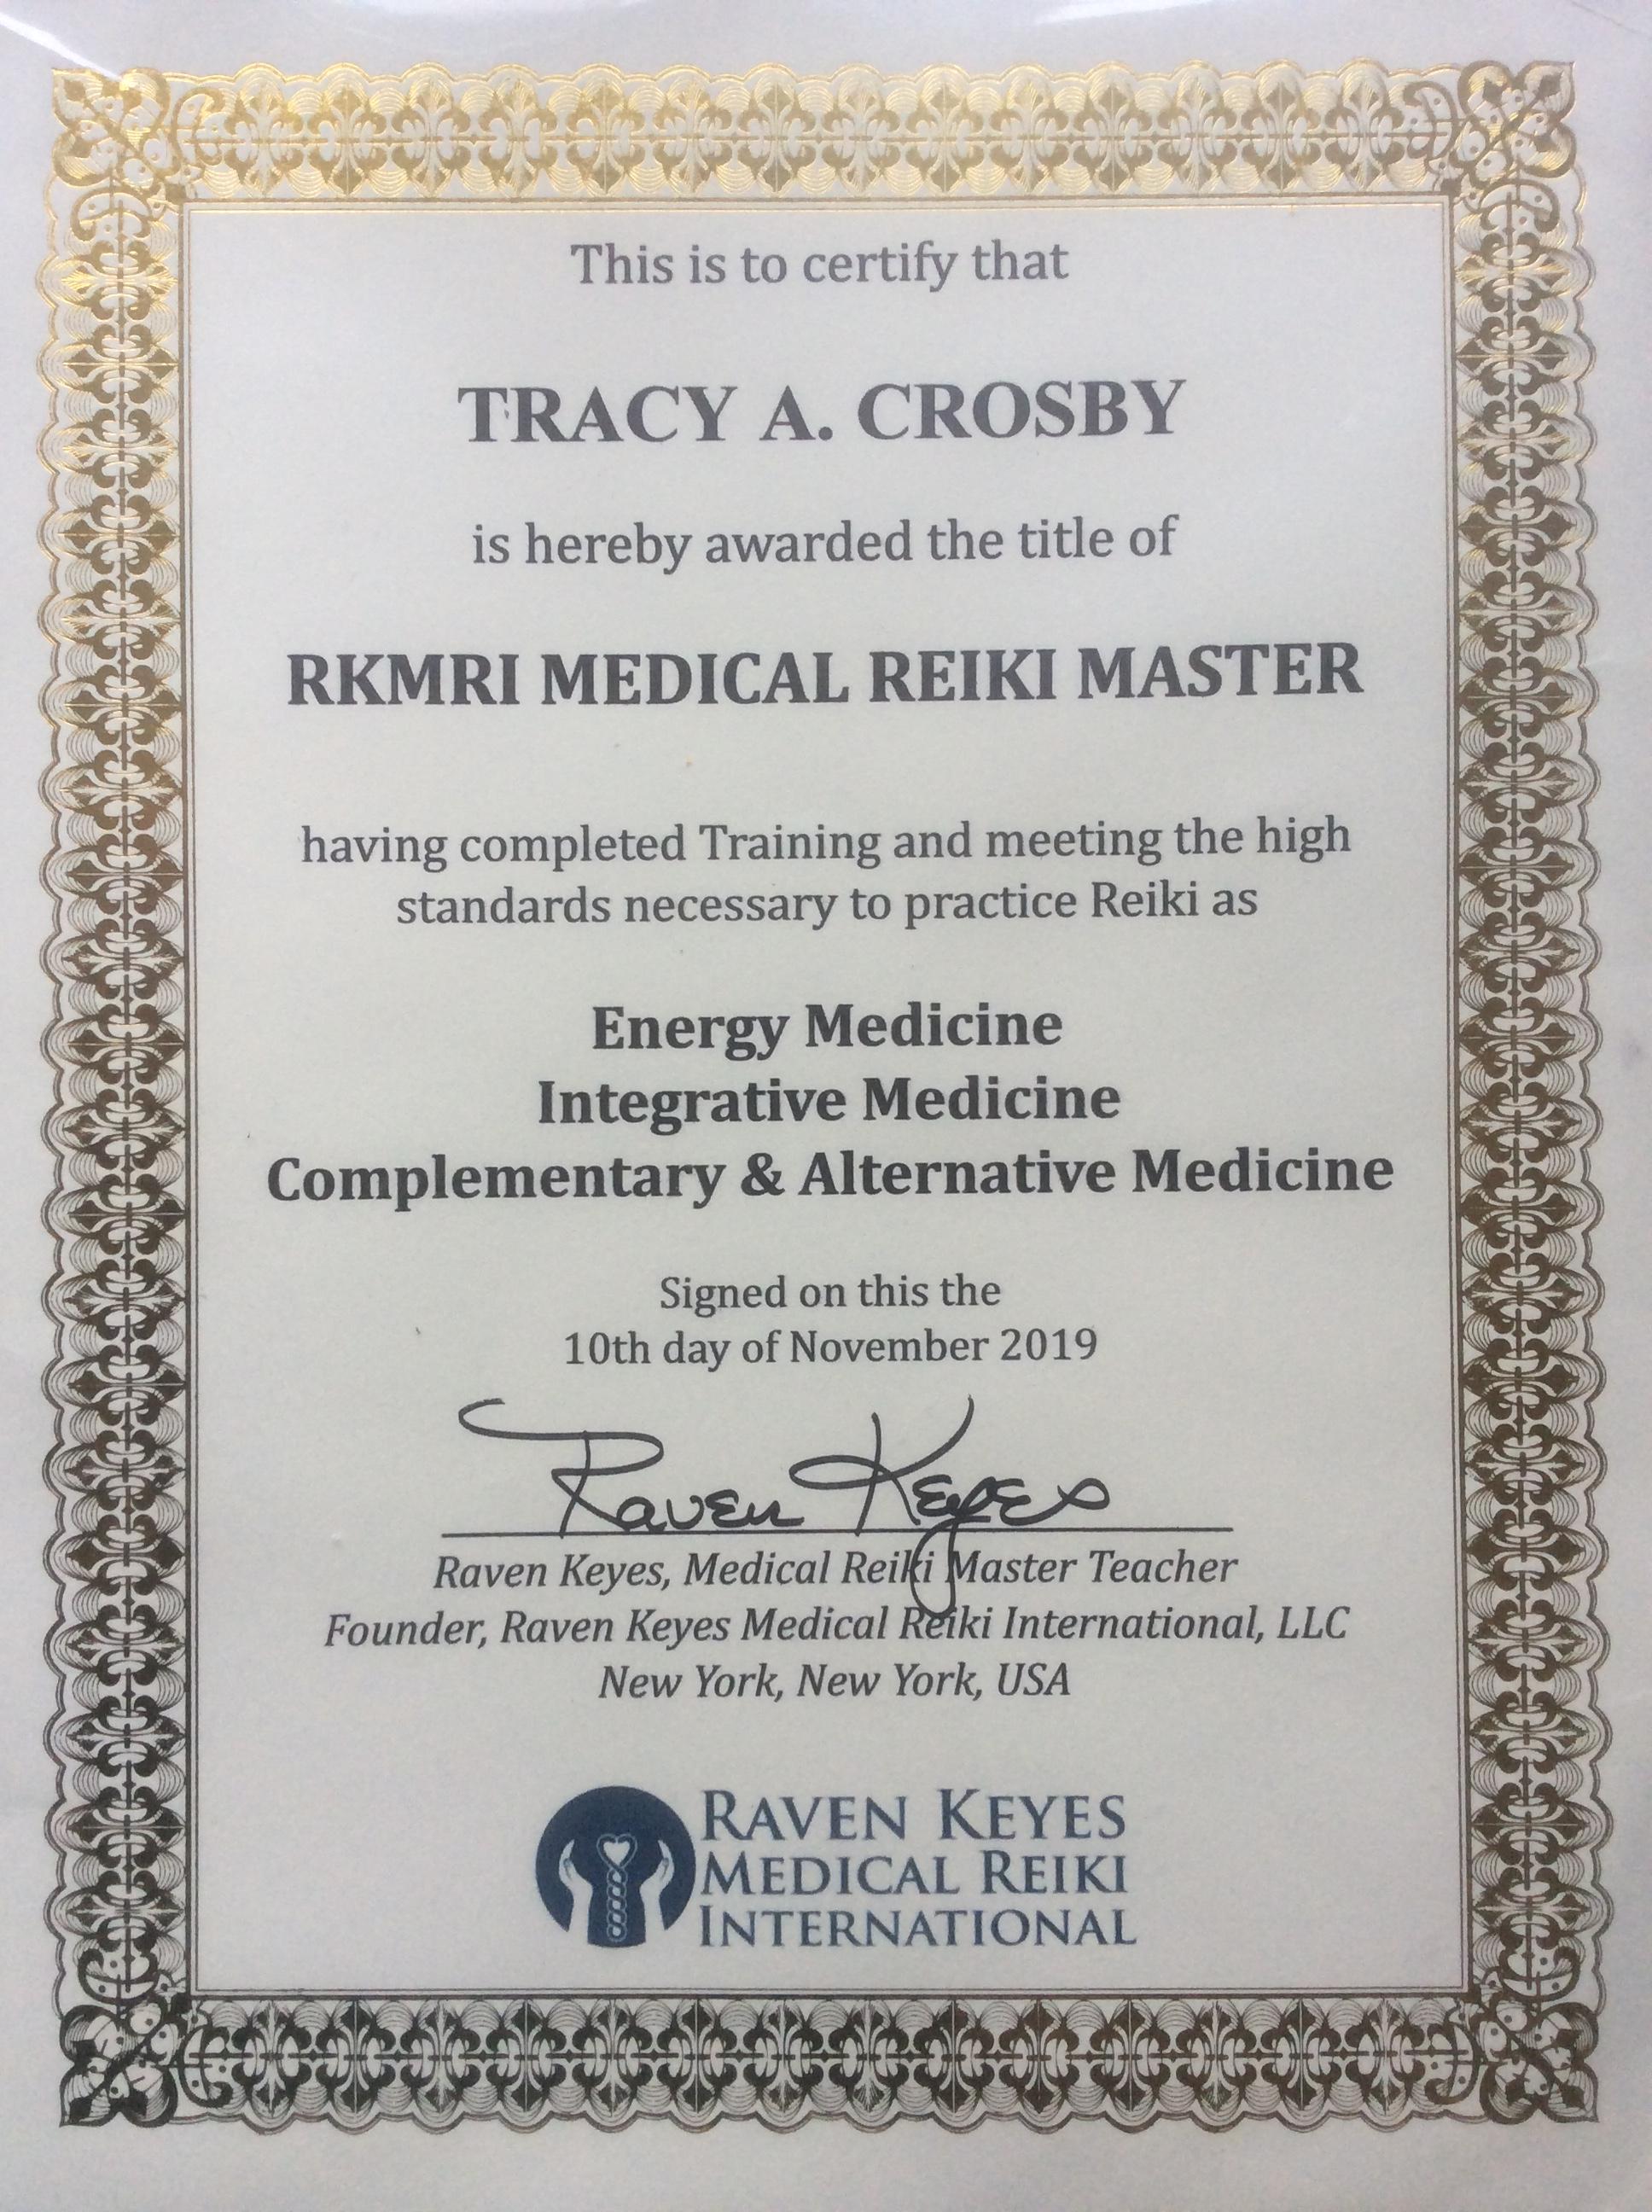 TACROSBY RKMRI Medical Reiki Certification